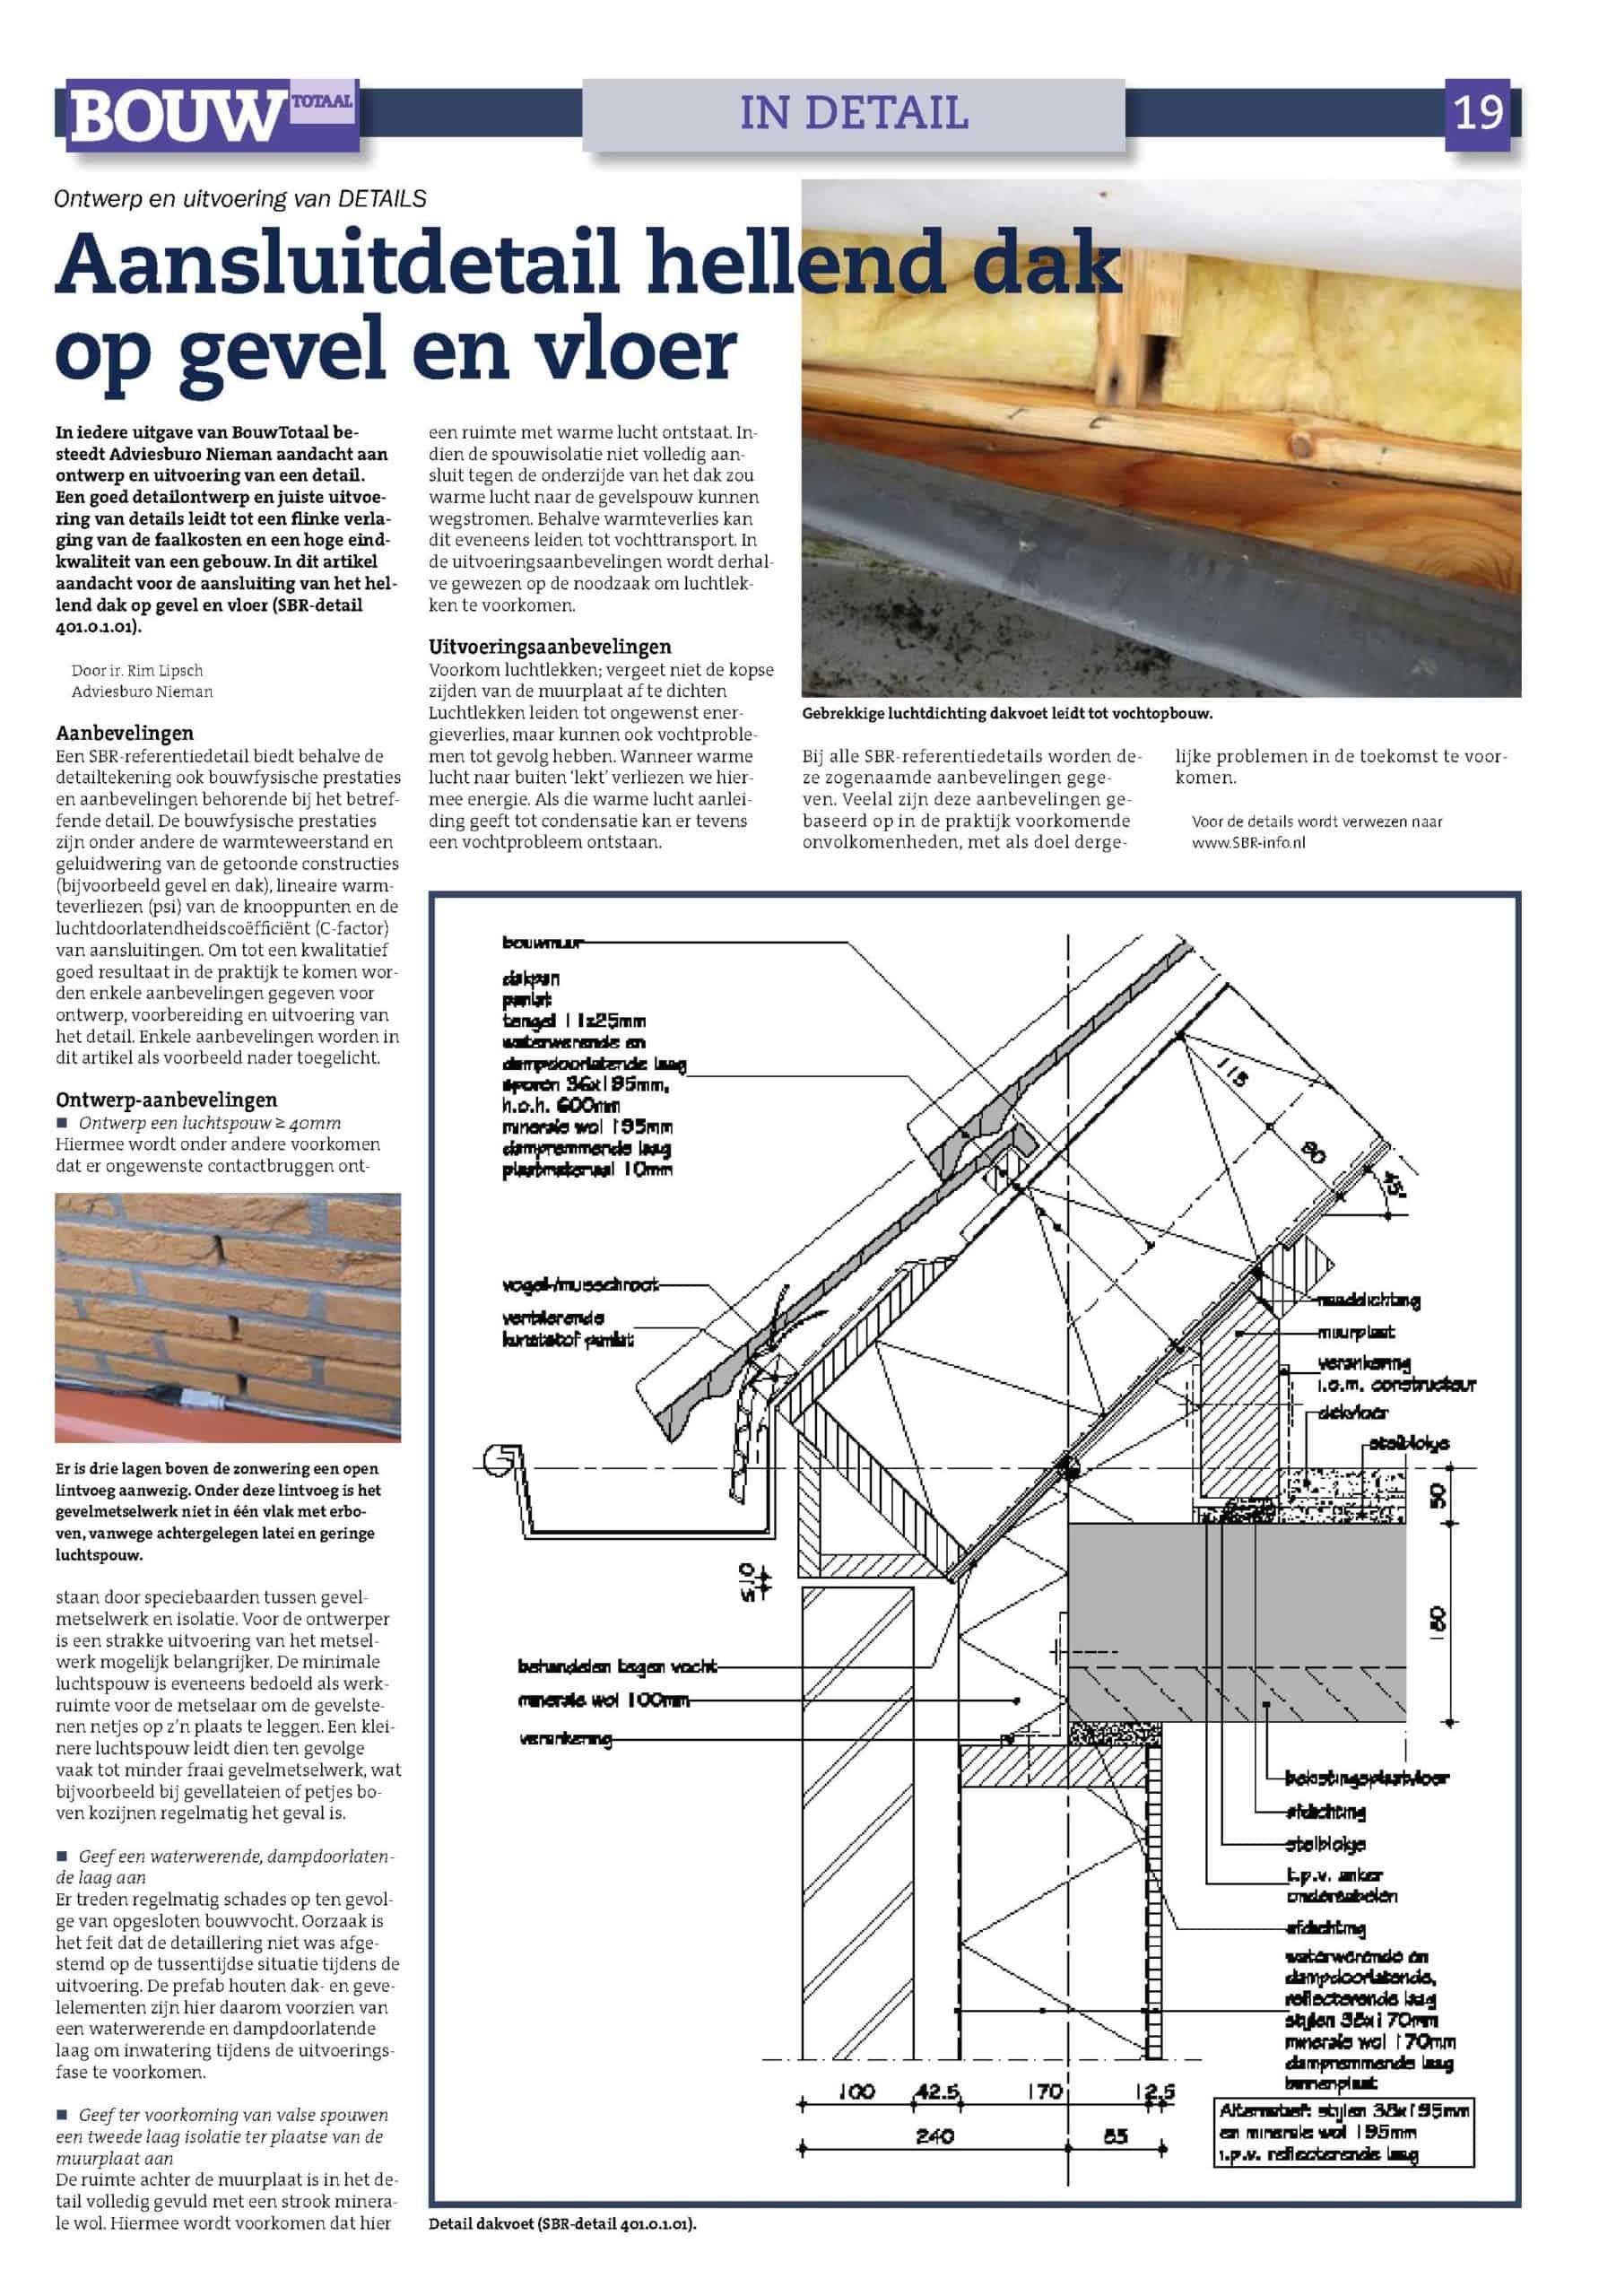 Bouwtotaal_BT.11.10.Detail_Aansluit-detail-hellend-dak-op-gevel-en-vloer_RLi-1-scaled